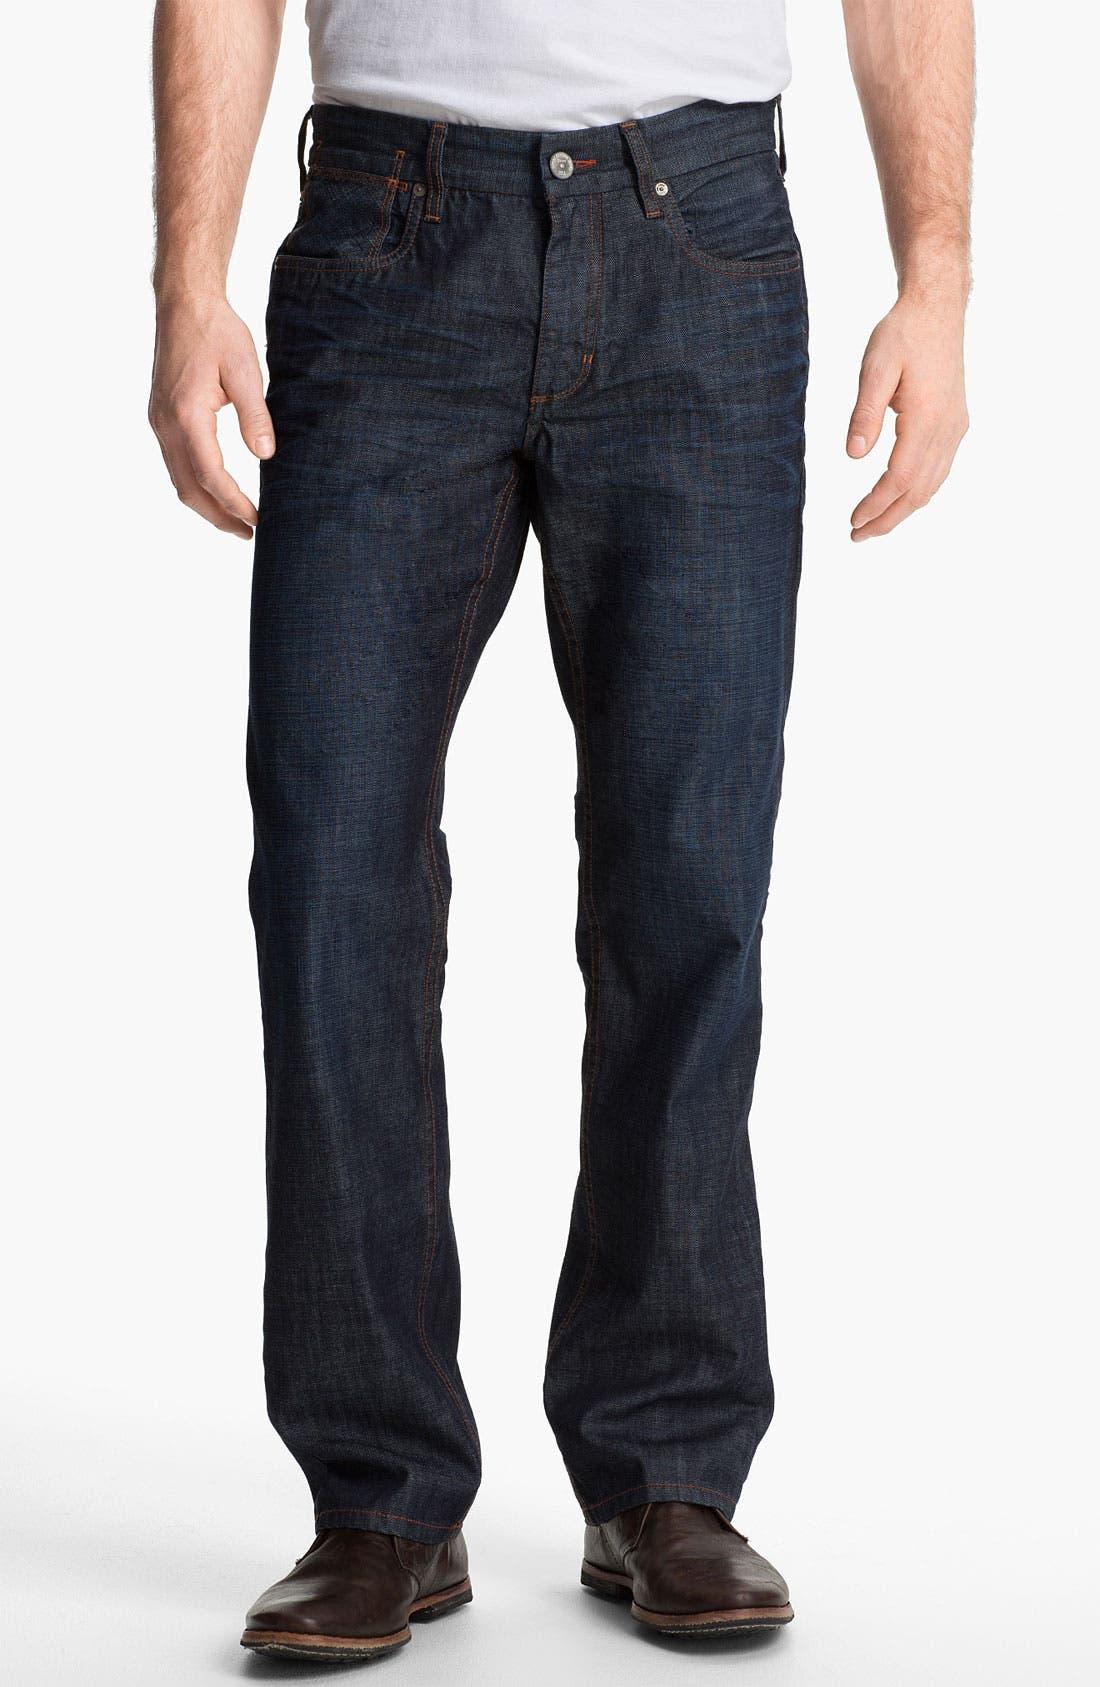 Alternate Image 1 Selected - Tommy Bahama Denim 'Cruz' Authentic Fit Jeans (Vintage Dark)